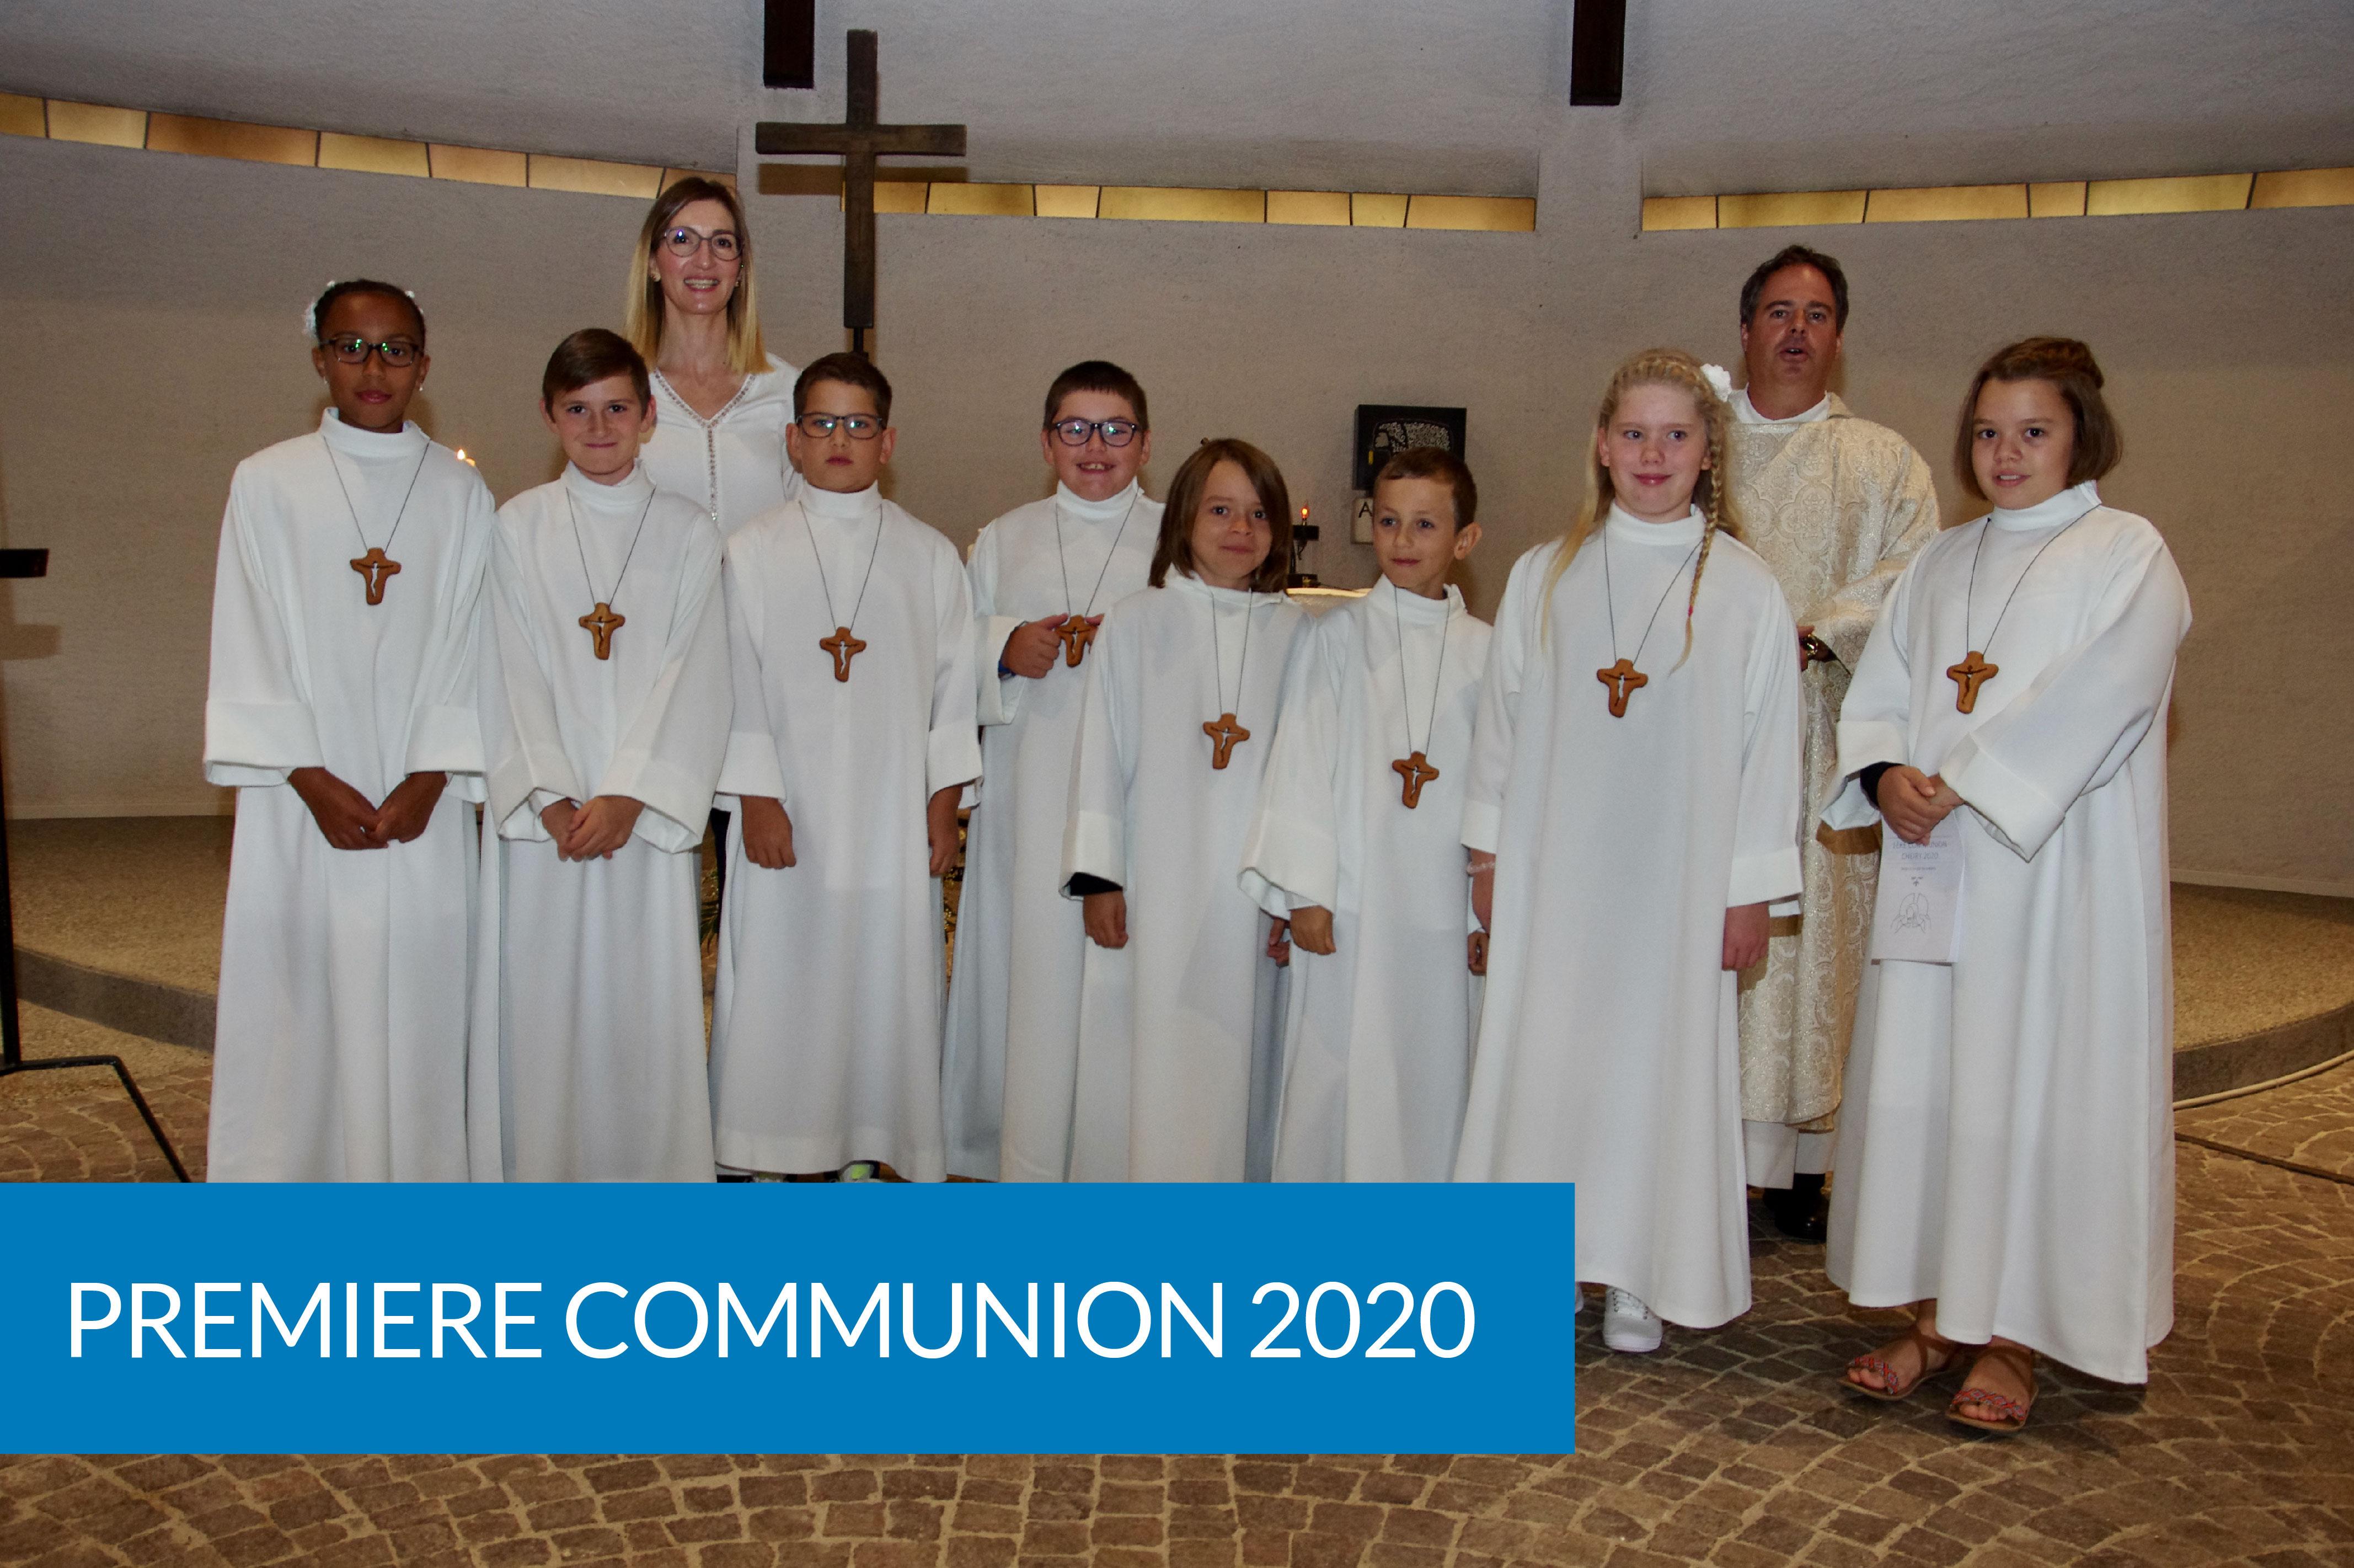 premierecommunion2020